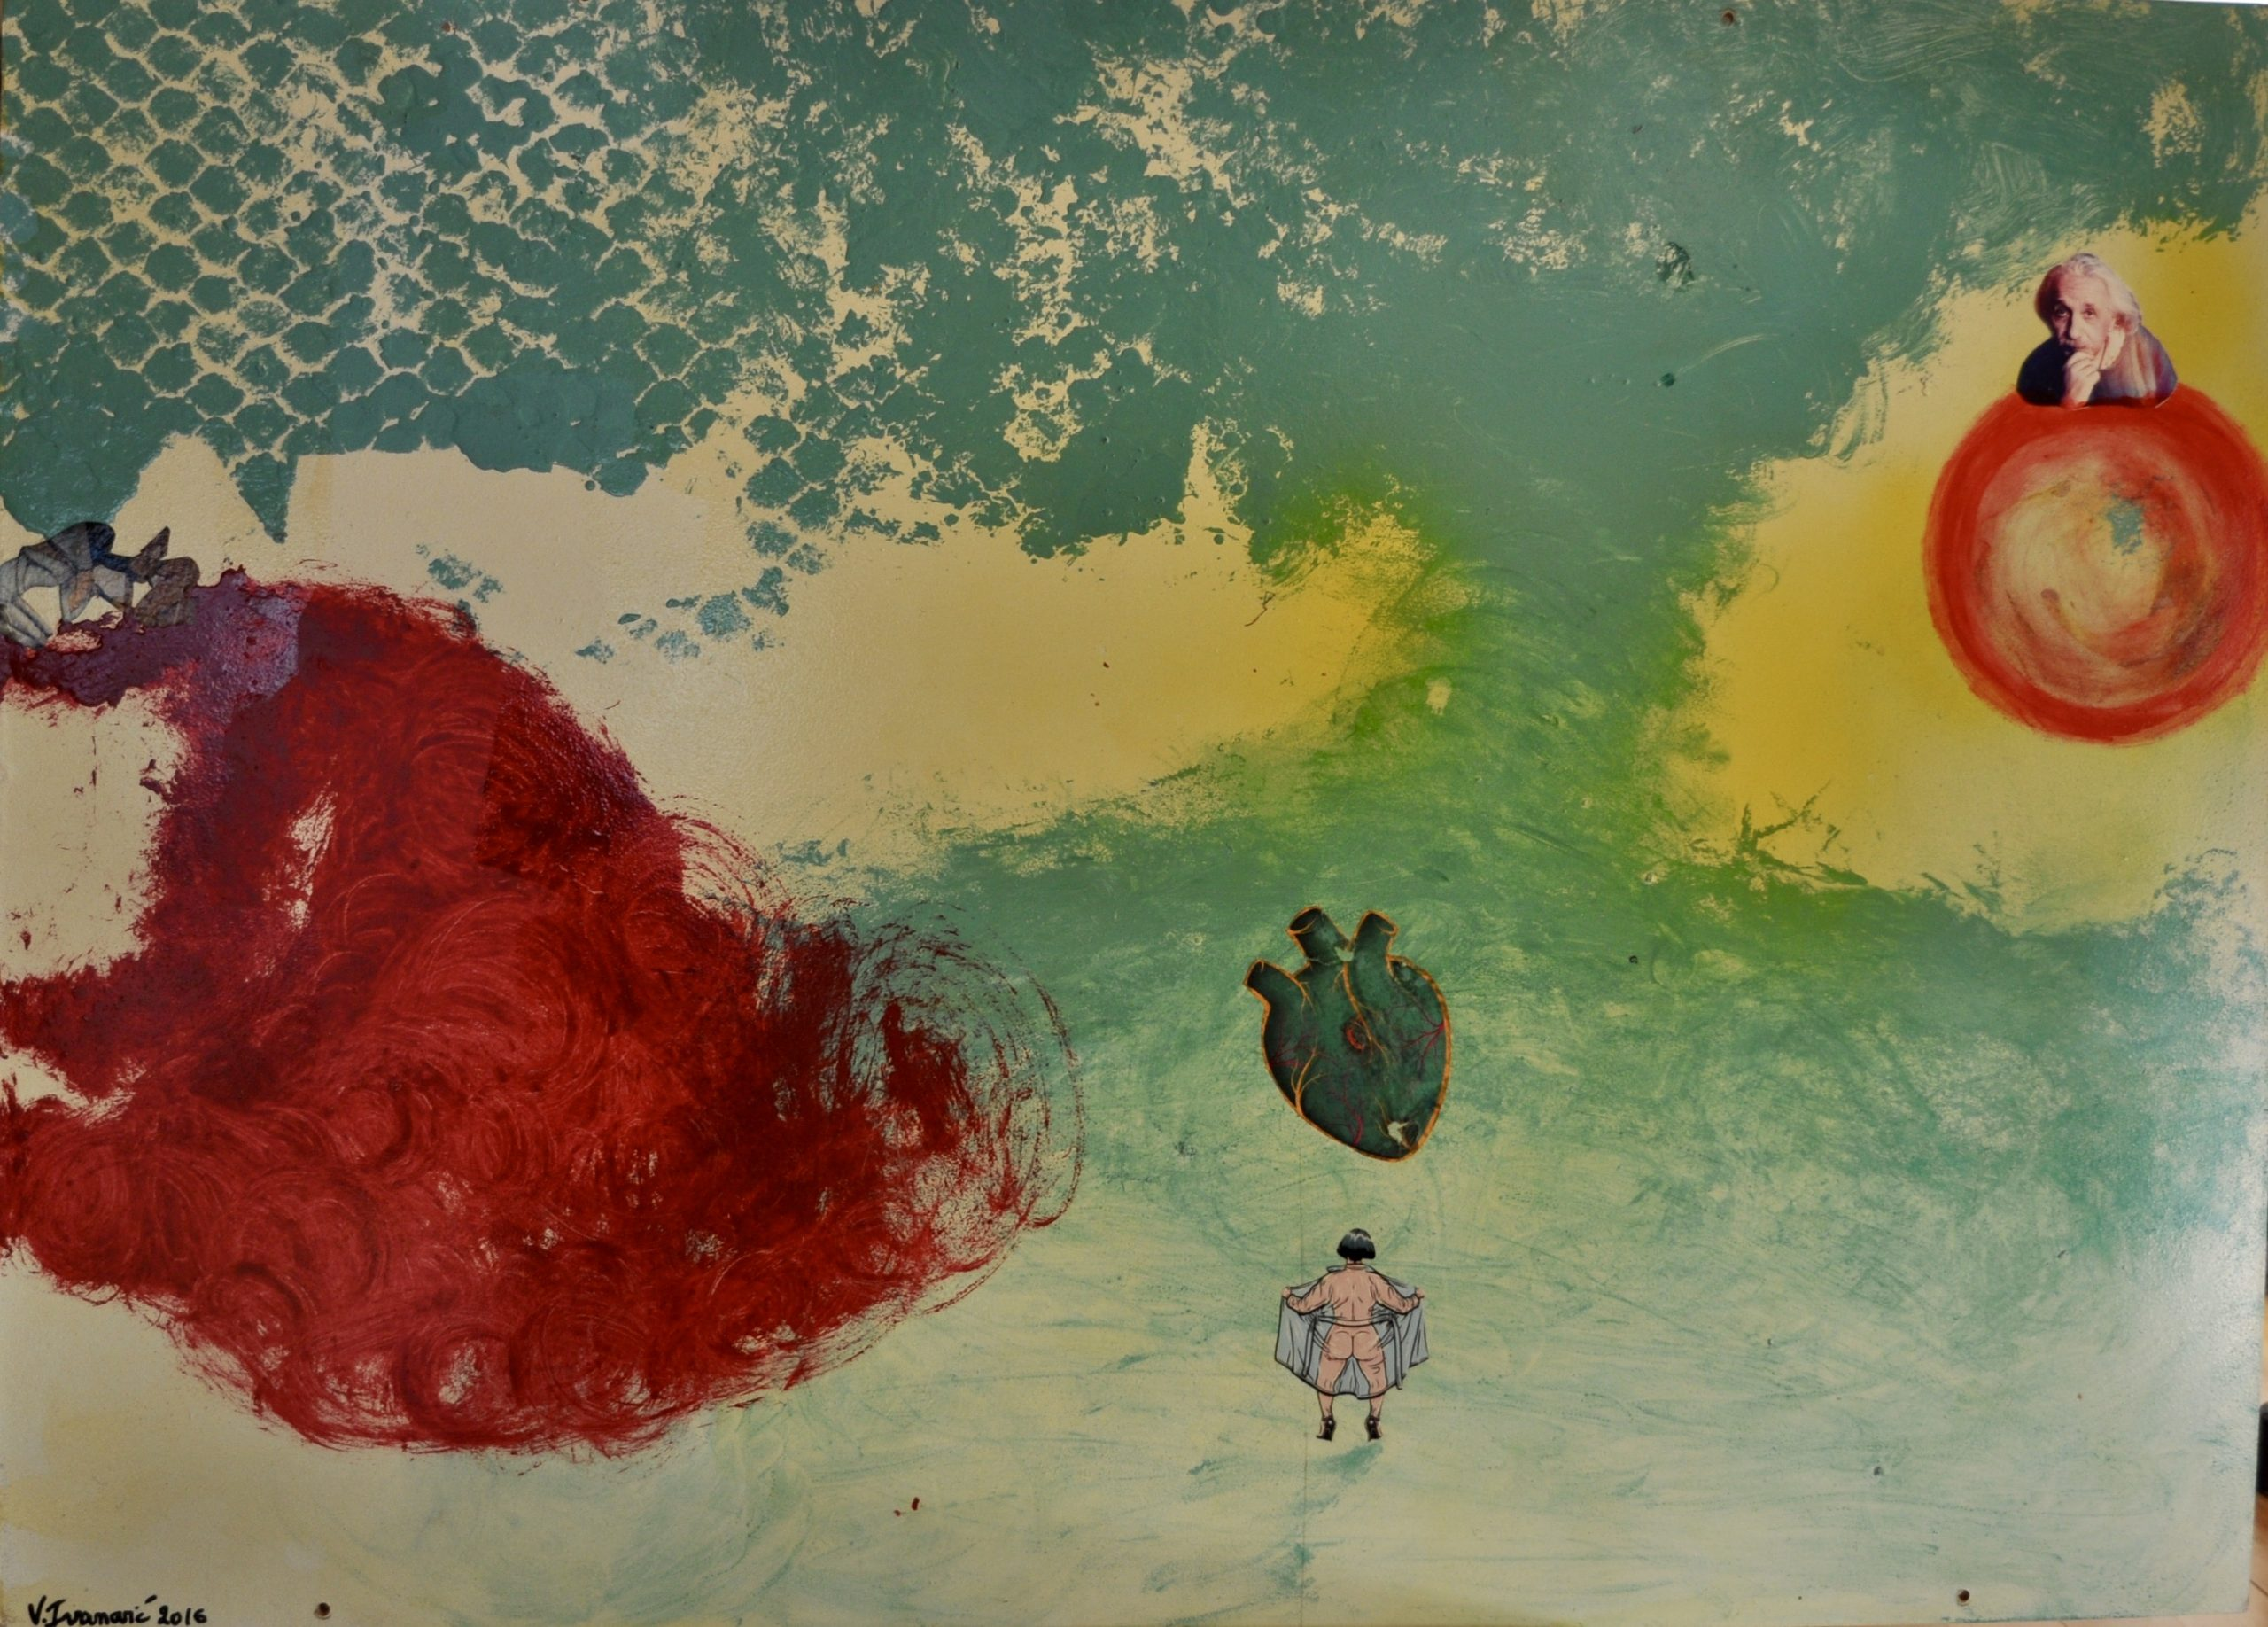 ART BASEL MIAMI BEACH/WHY DON'T YOU SHOW ME LOVE